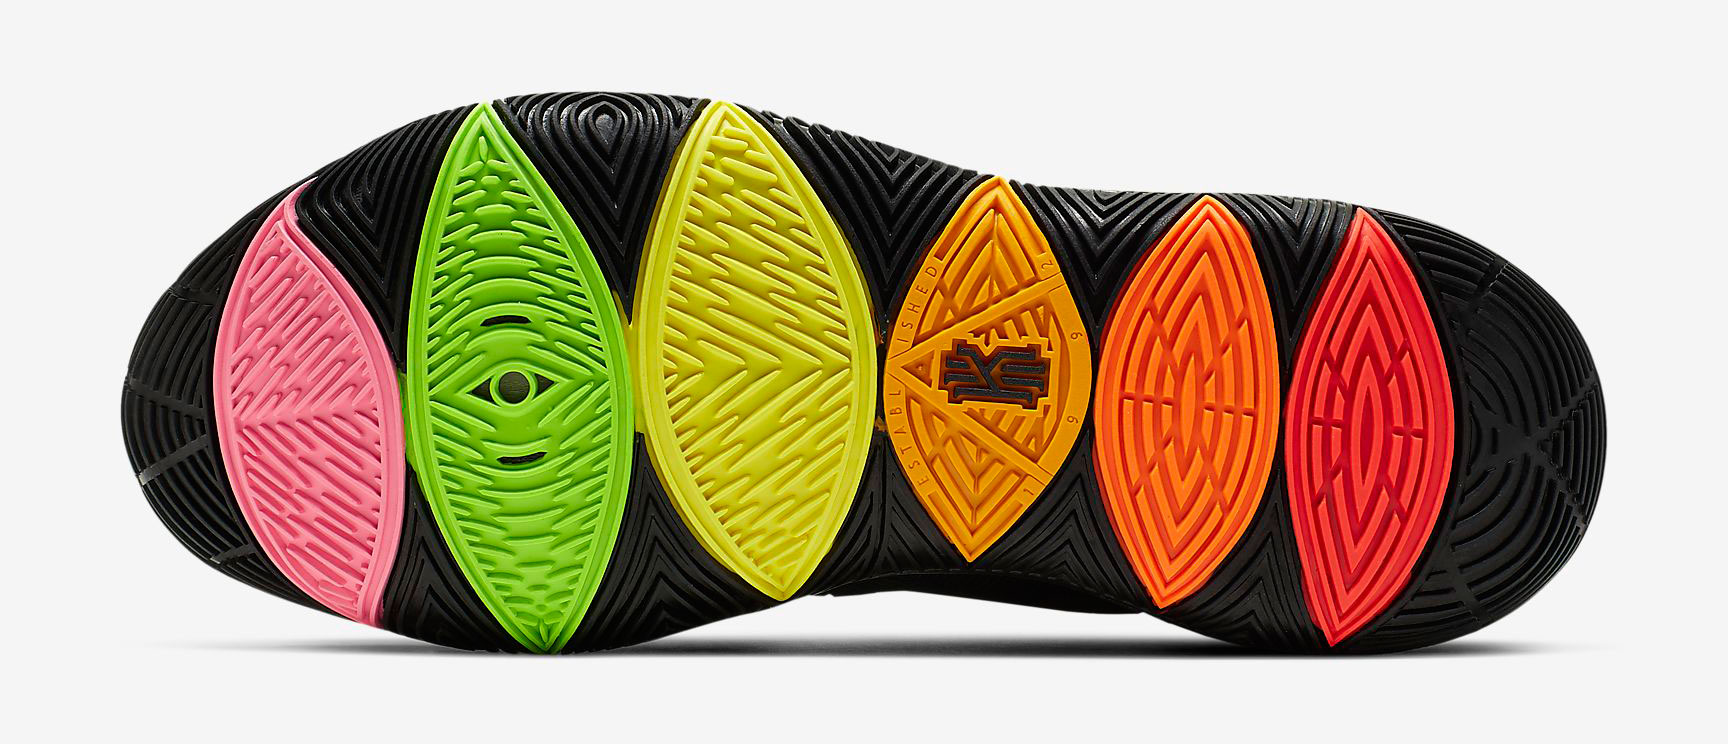 huge selection of 62ca7 e7109 Nike Kyrie 5 Triple Black Where to Buy | SneakerFits.com